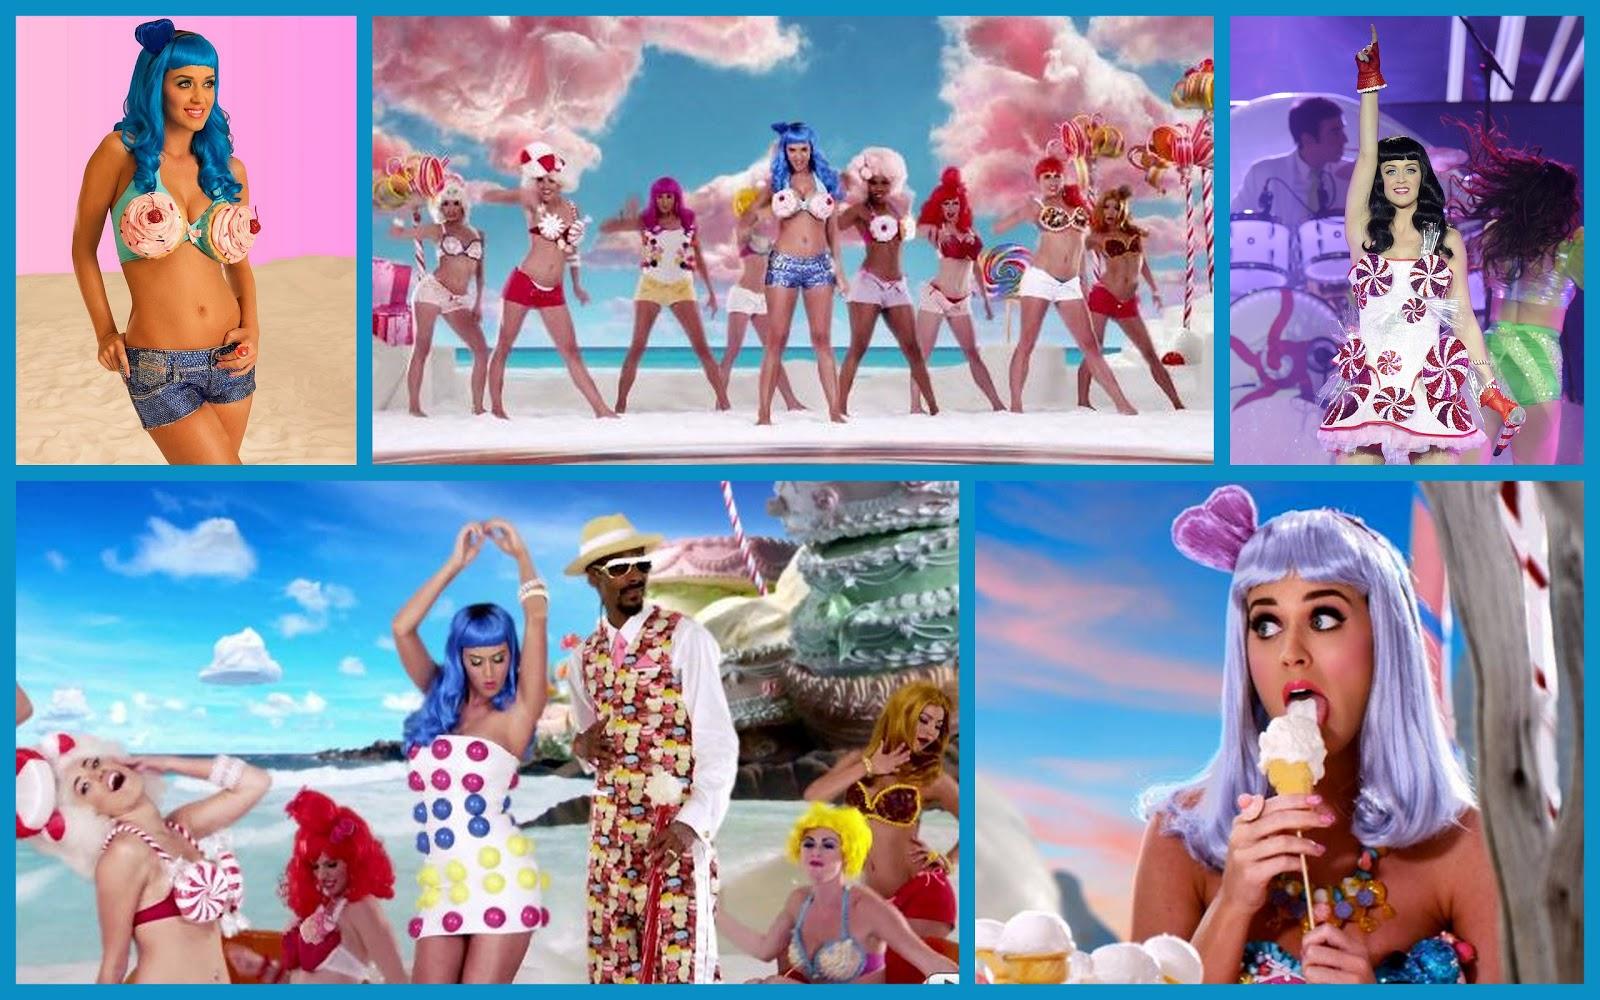 http://2.bp.blogspot.com/-8H_VqZY--b8/Th22uFJDViI/AAAAAAAAhDI/Nh7mZKlvhQ8/s1600/Katy%2BPerry%2Bcandy%2Boutfits%2BCalifornia%2Bgirls%2Bvideo.jpg